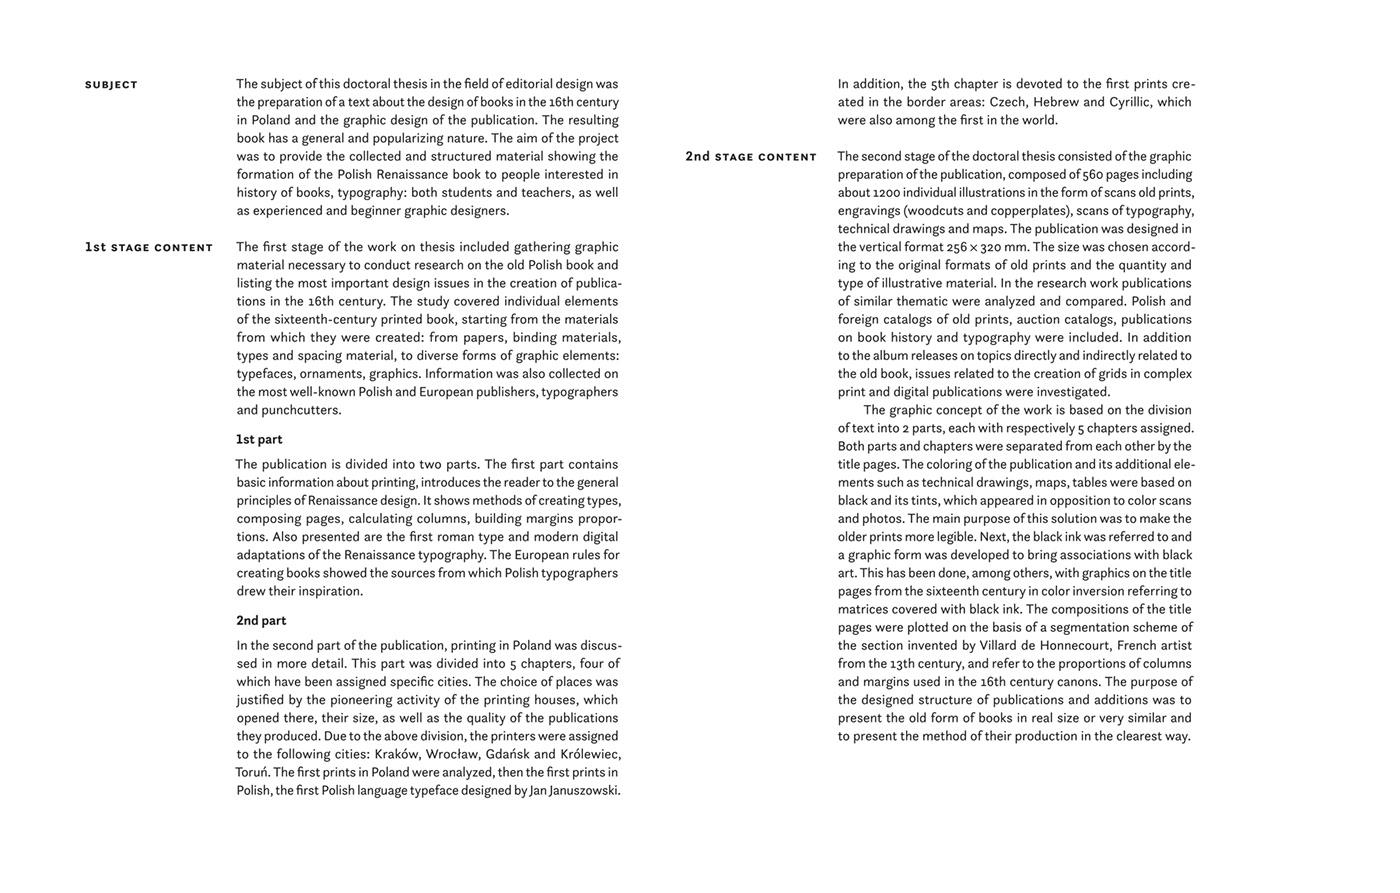 book design History of Typography Renaissance 16th Century Design roman type